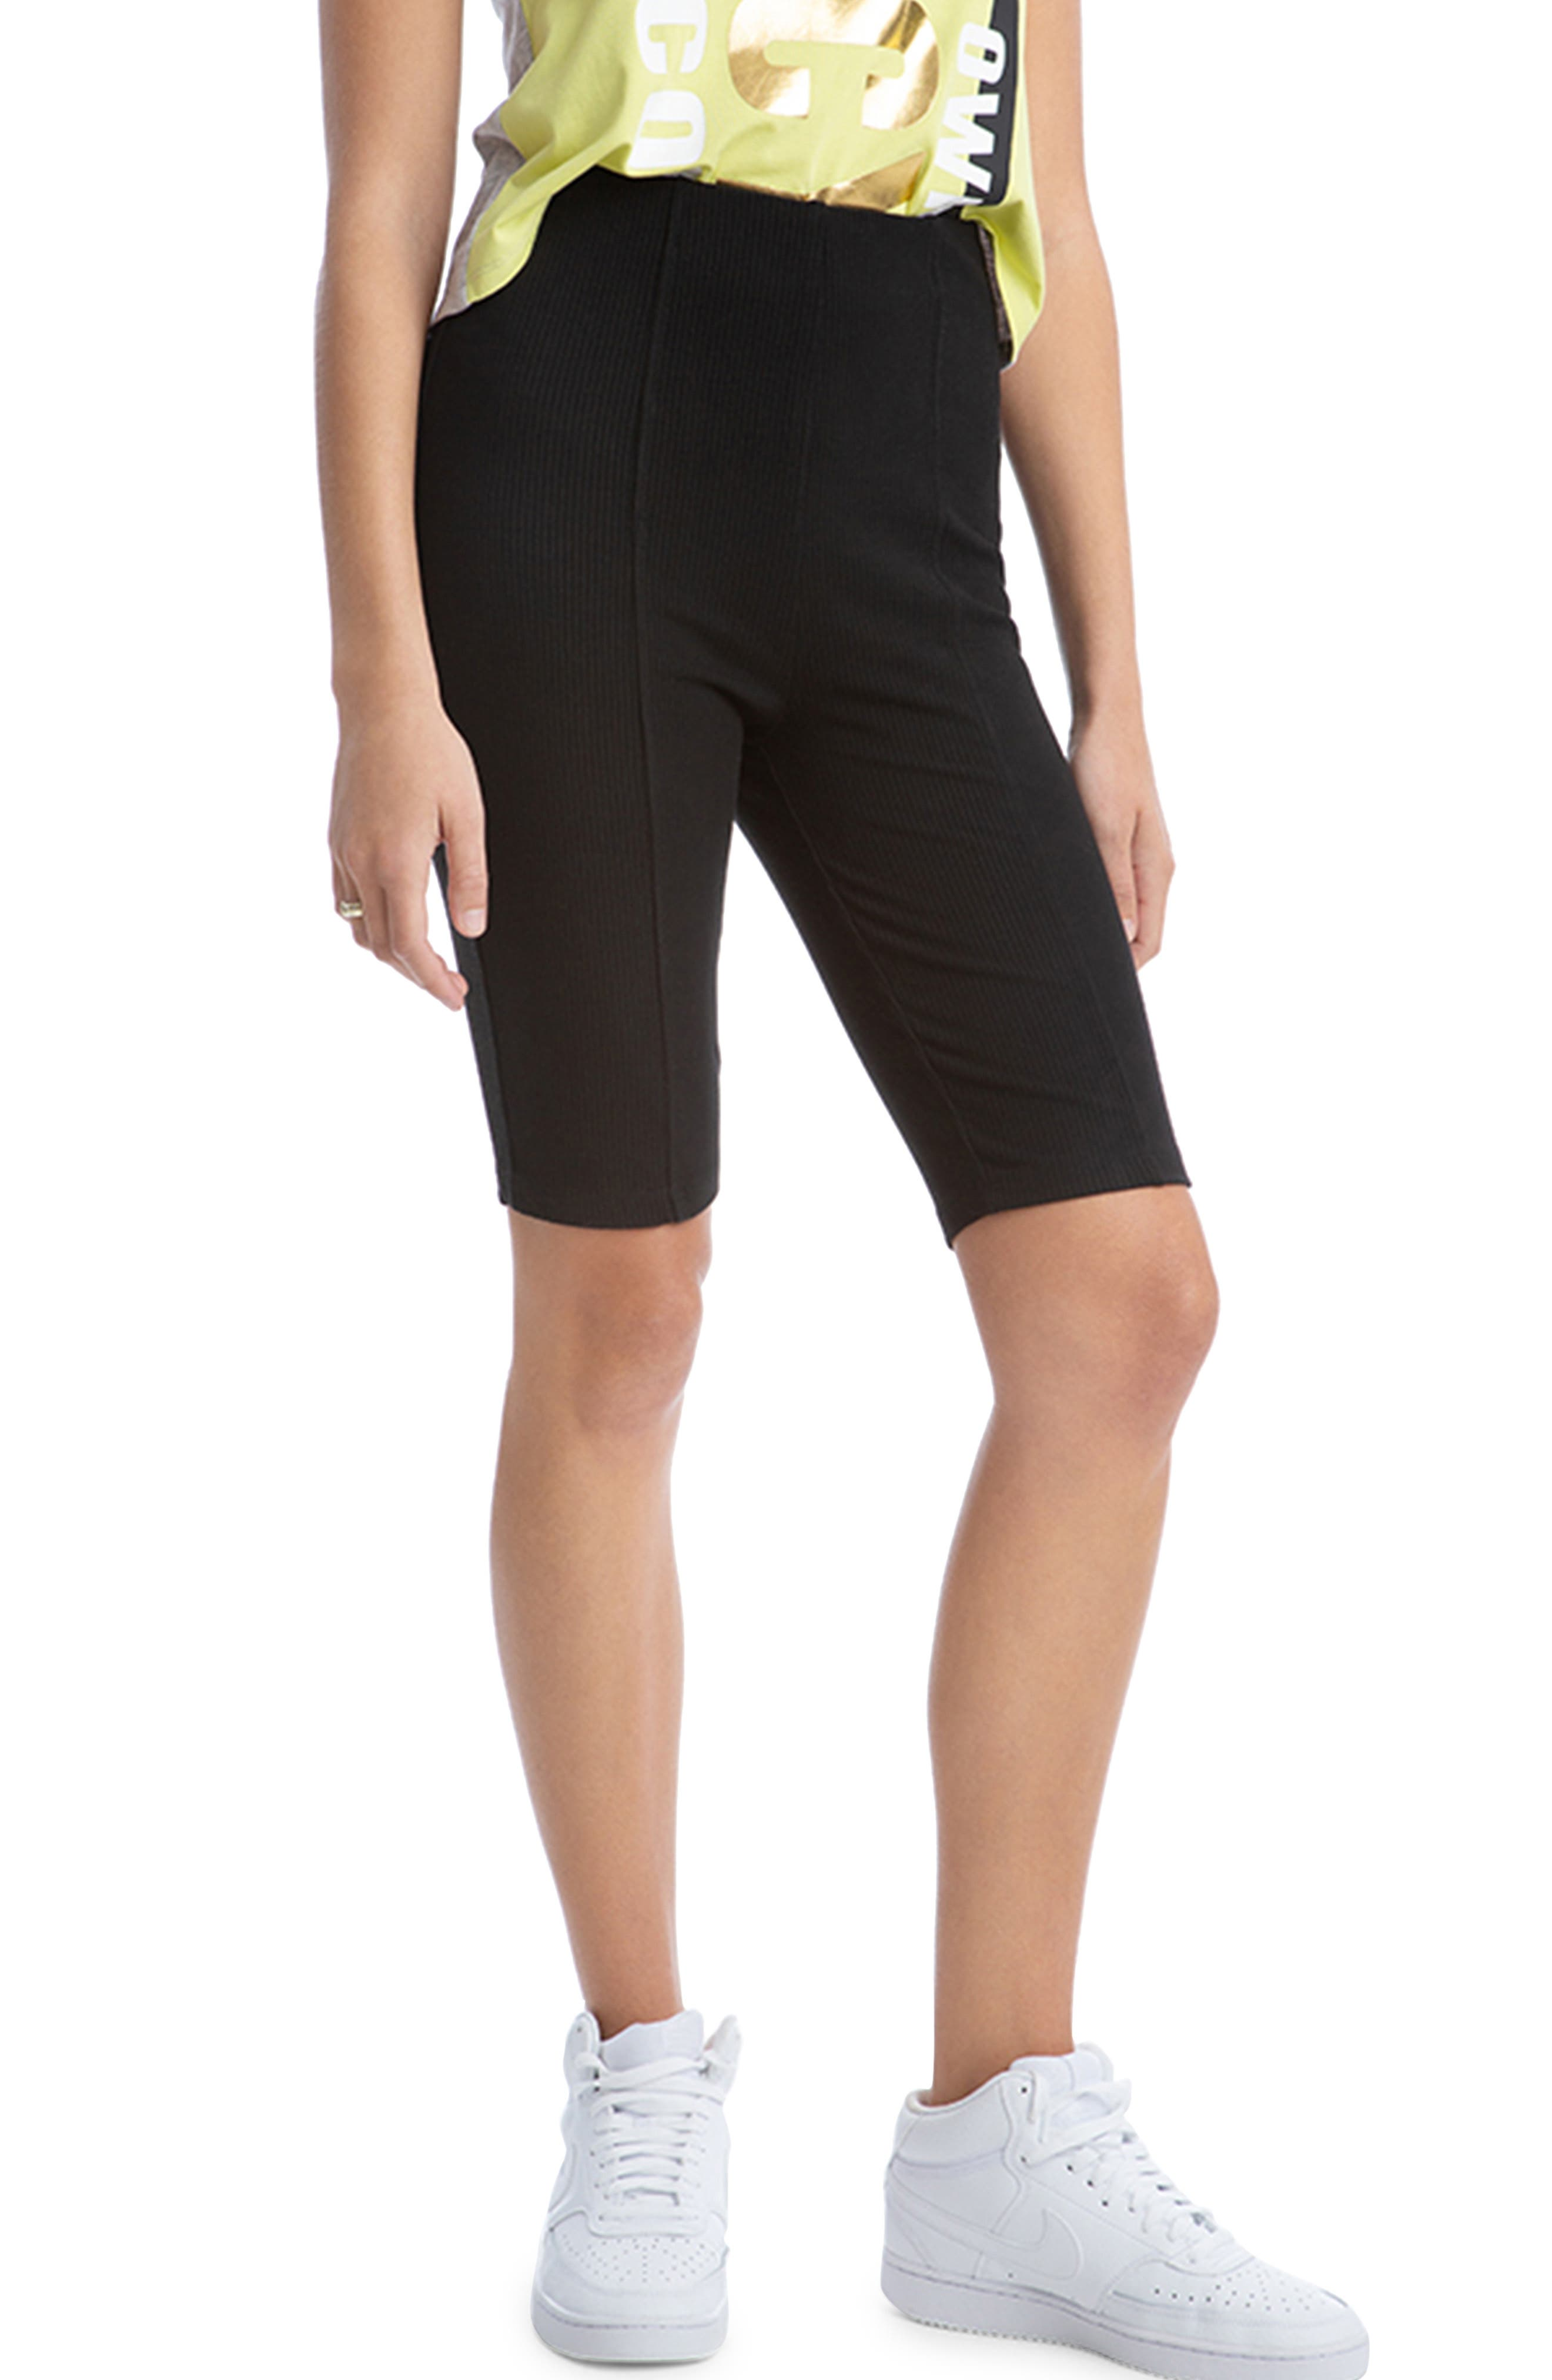 Rib Biker Shorts